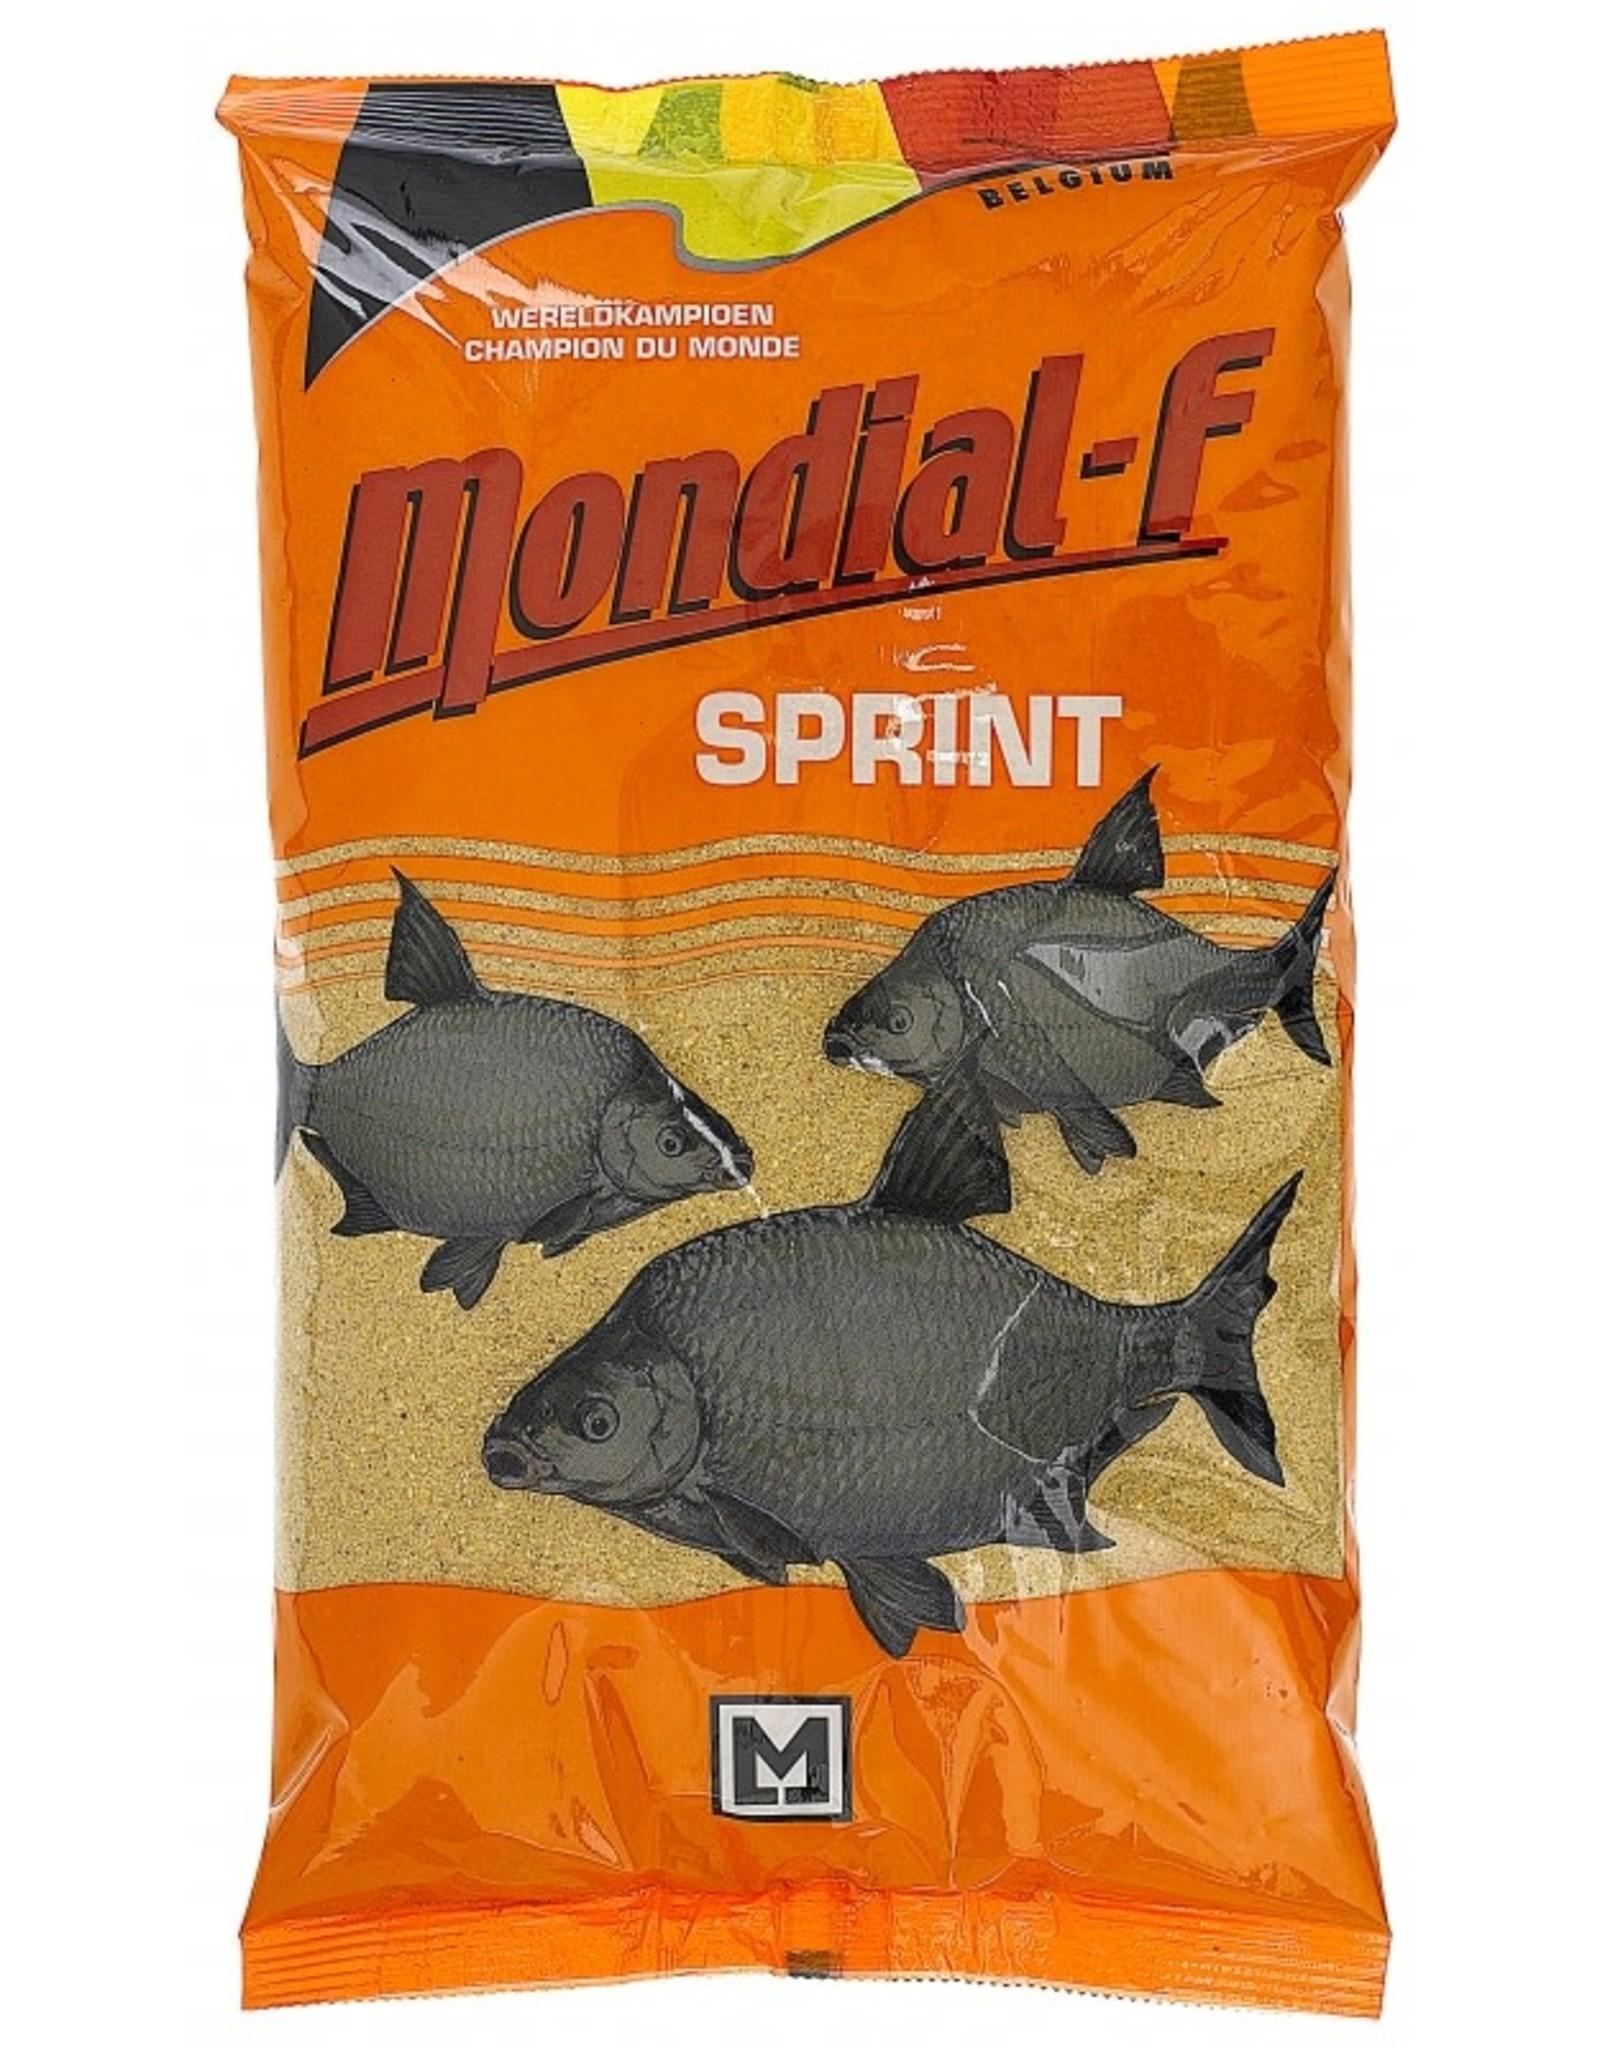 MONDIAL-F SPRINT 1KG